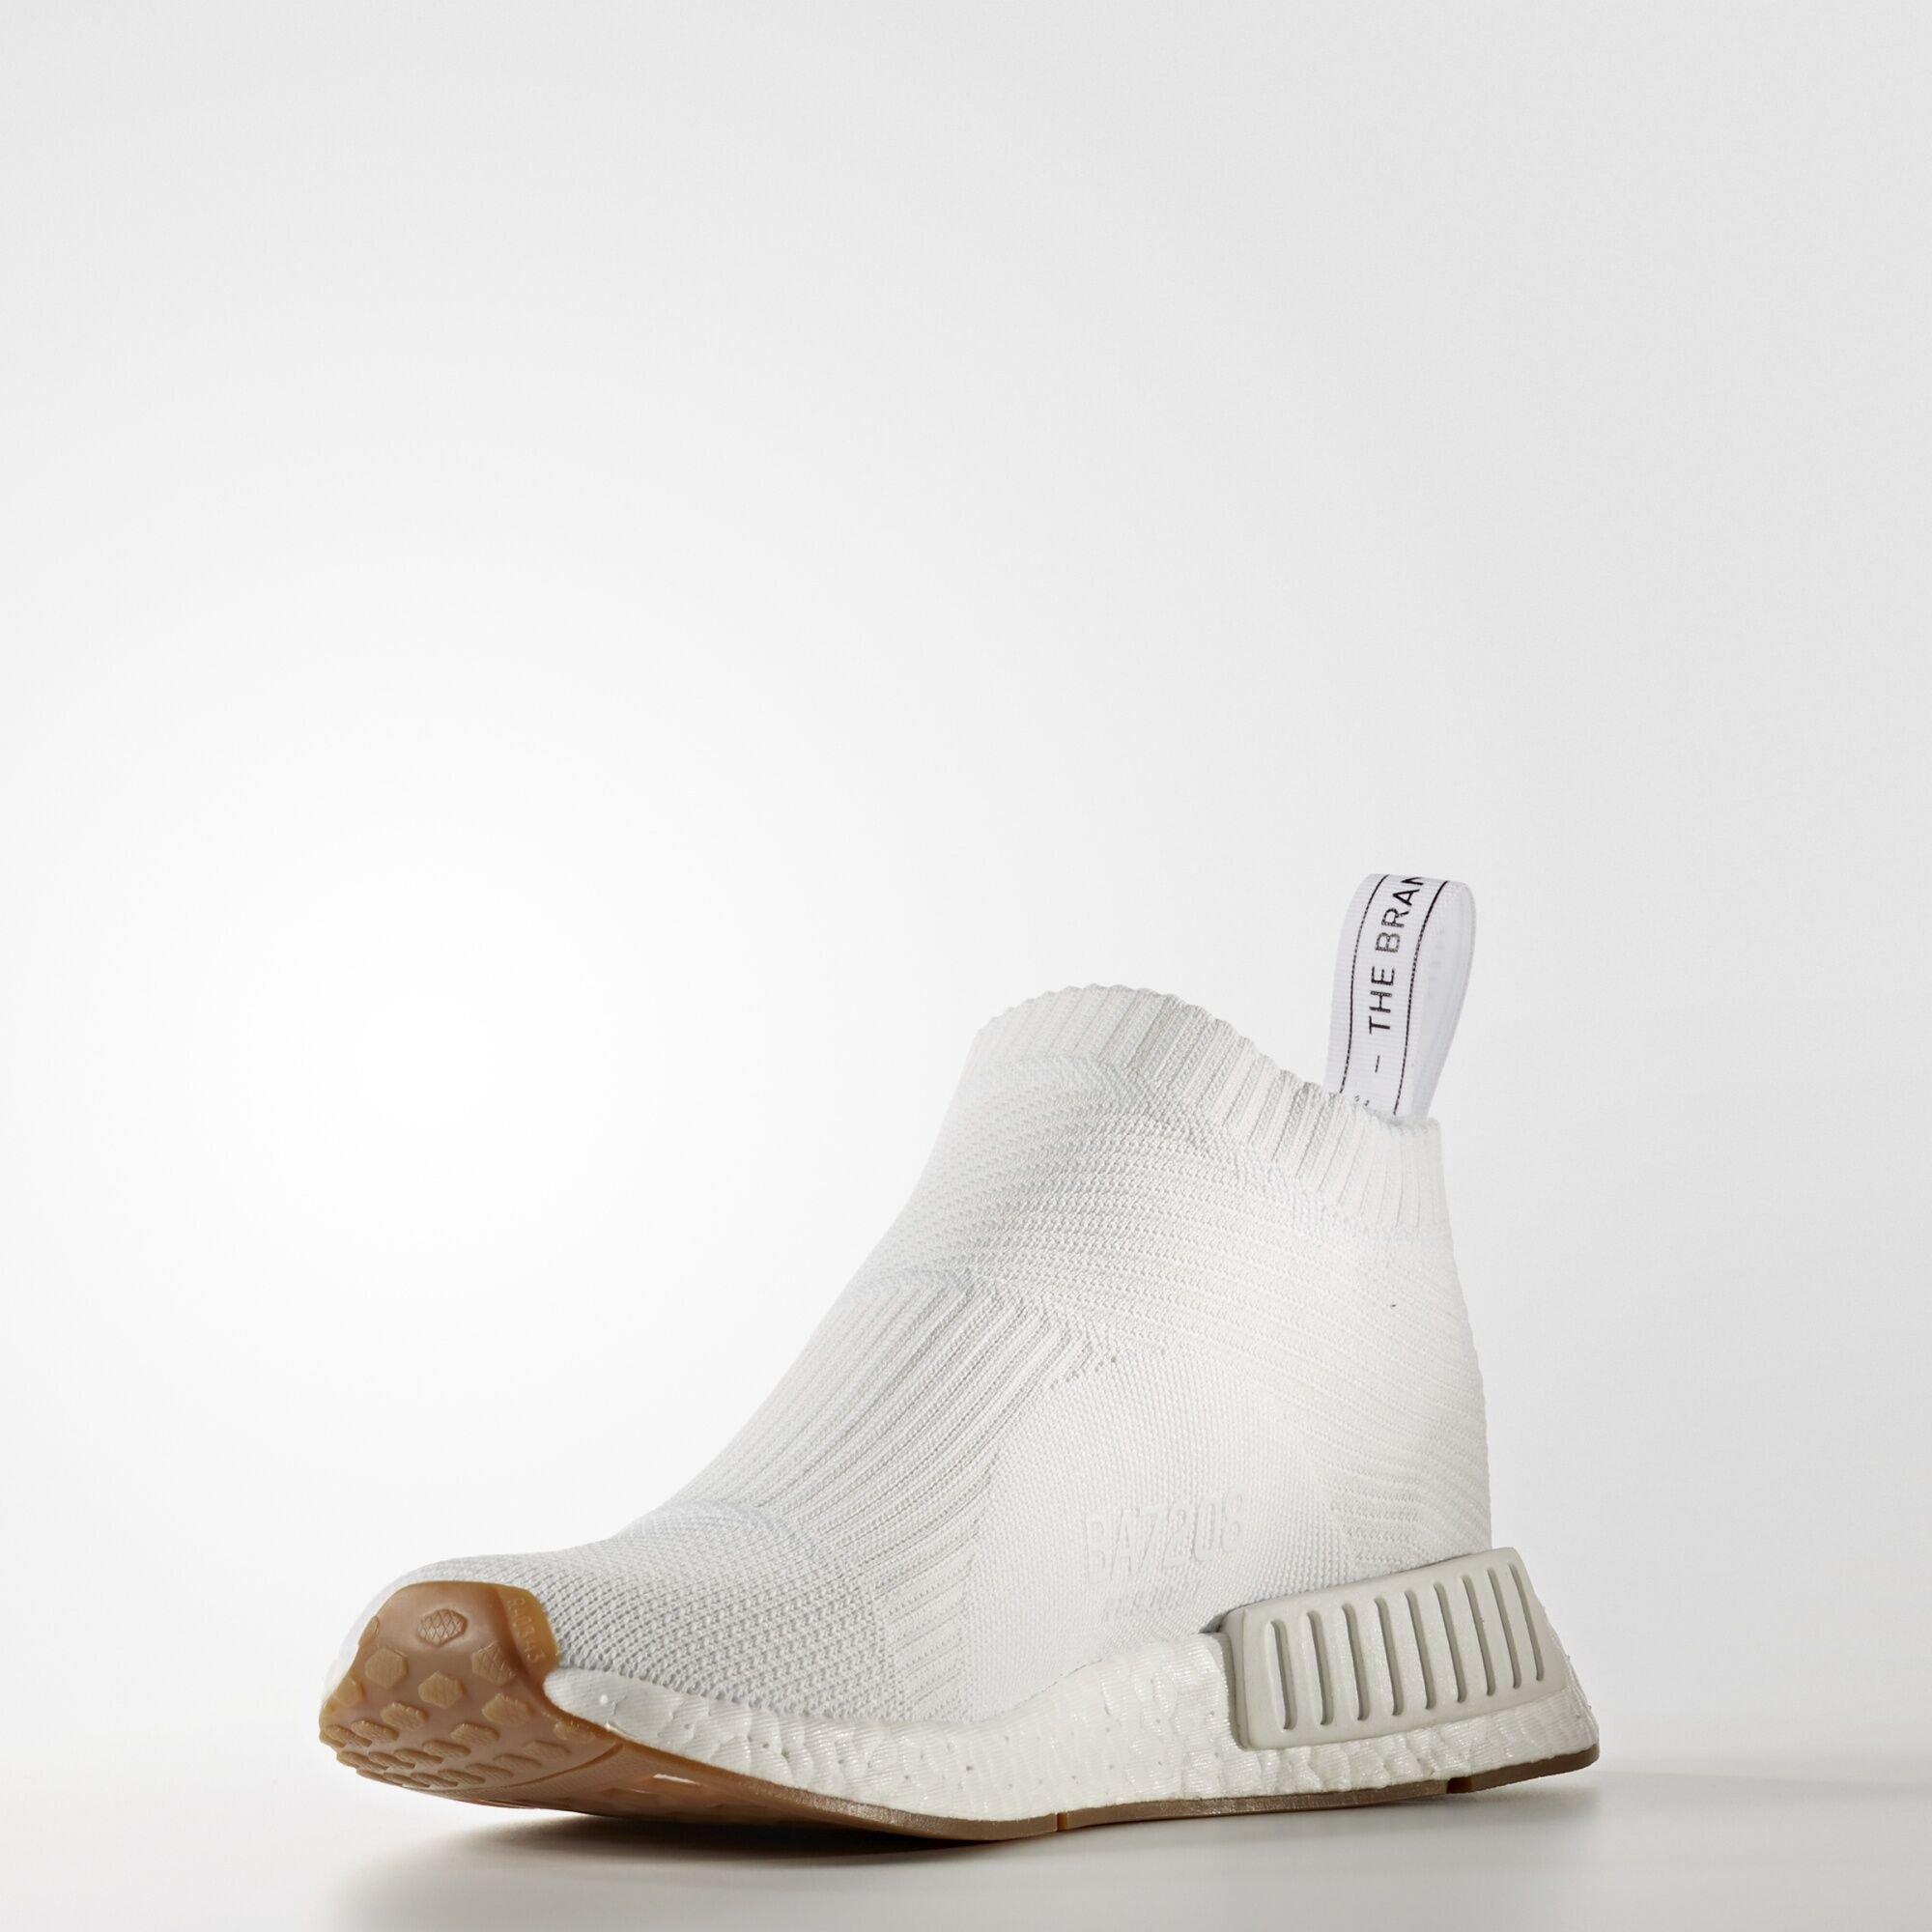 adidas  NMD City Sock Gum Pack White (BA7208)